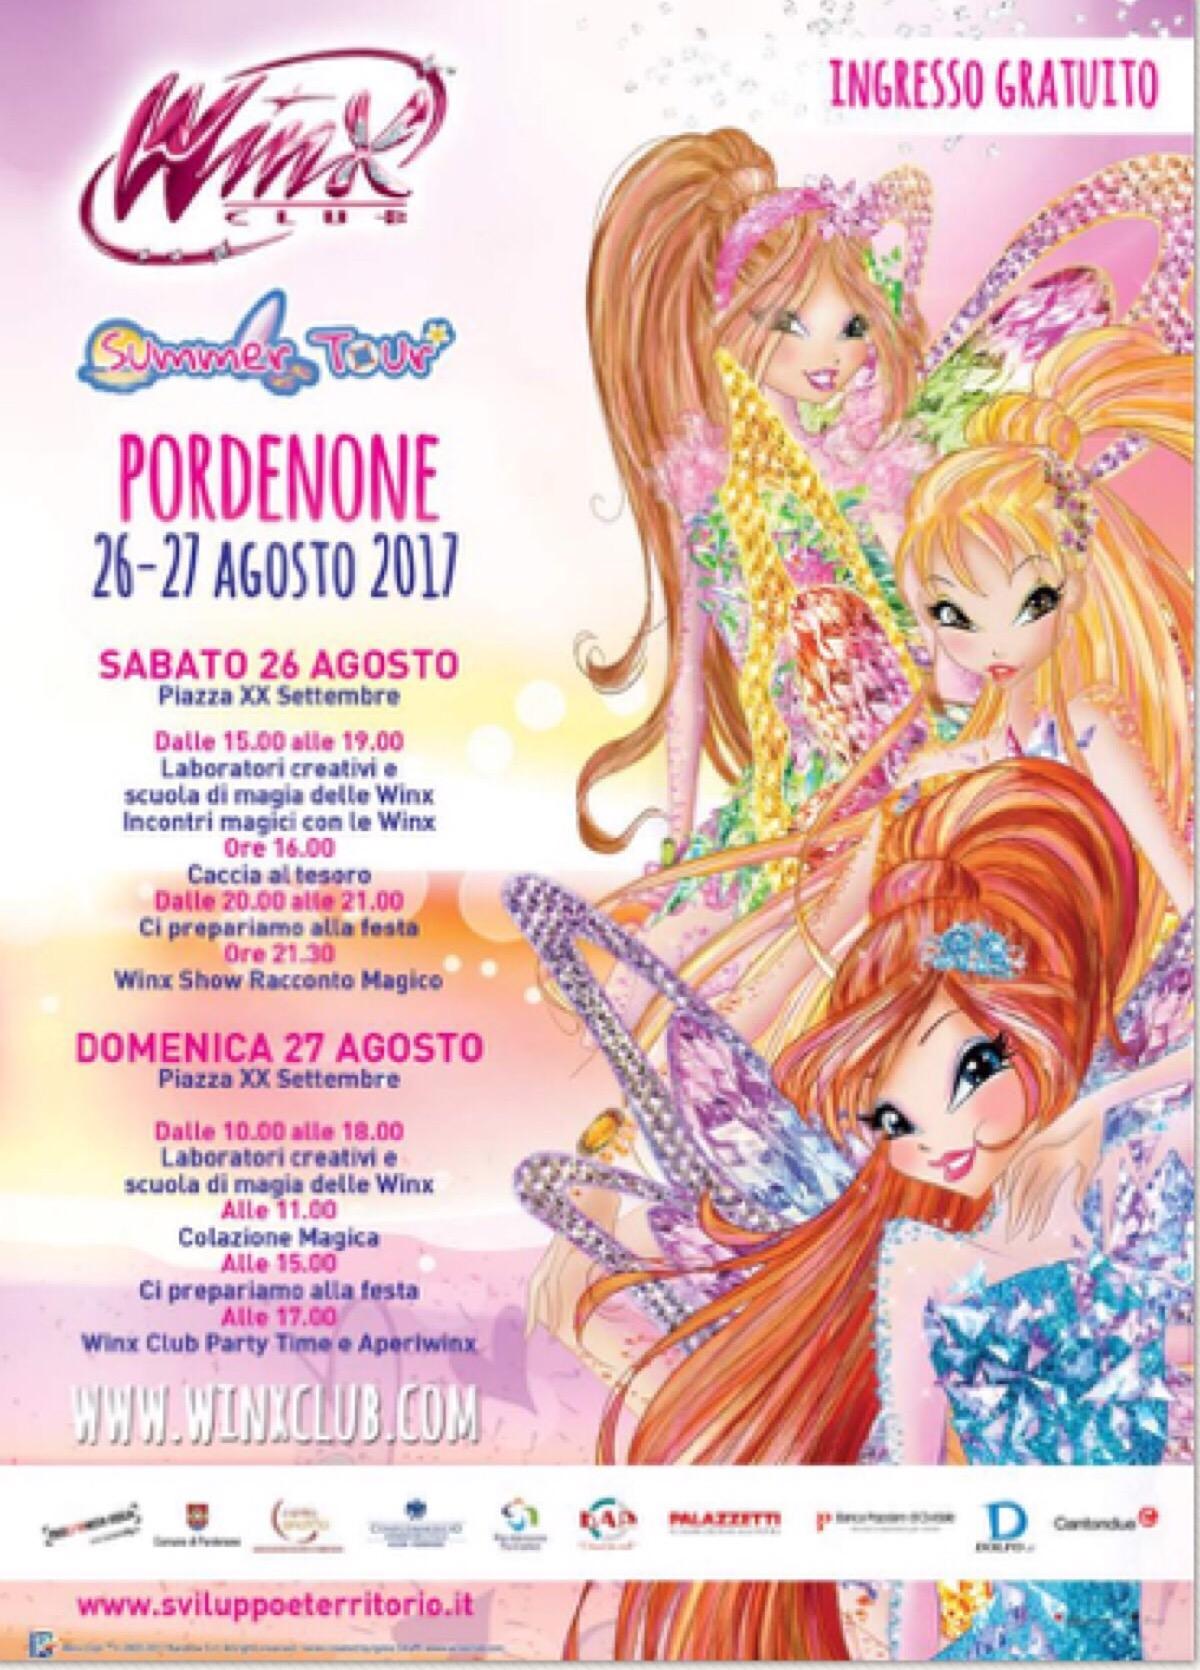 Winx summer tour Pordenone 26/27 agosto